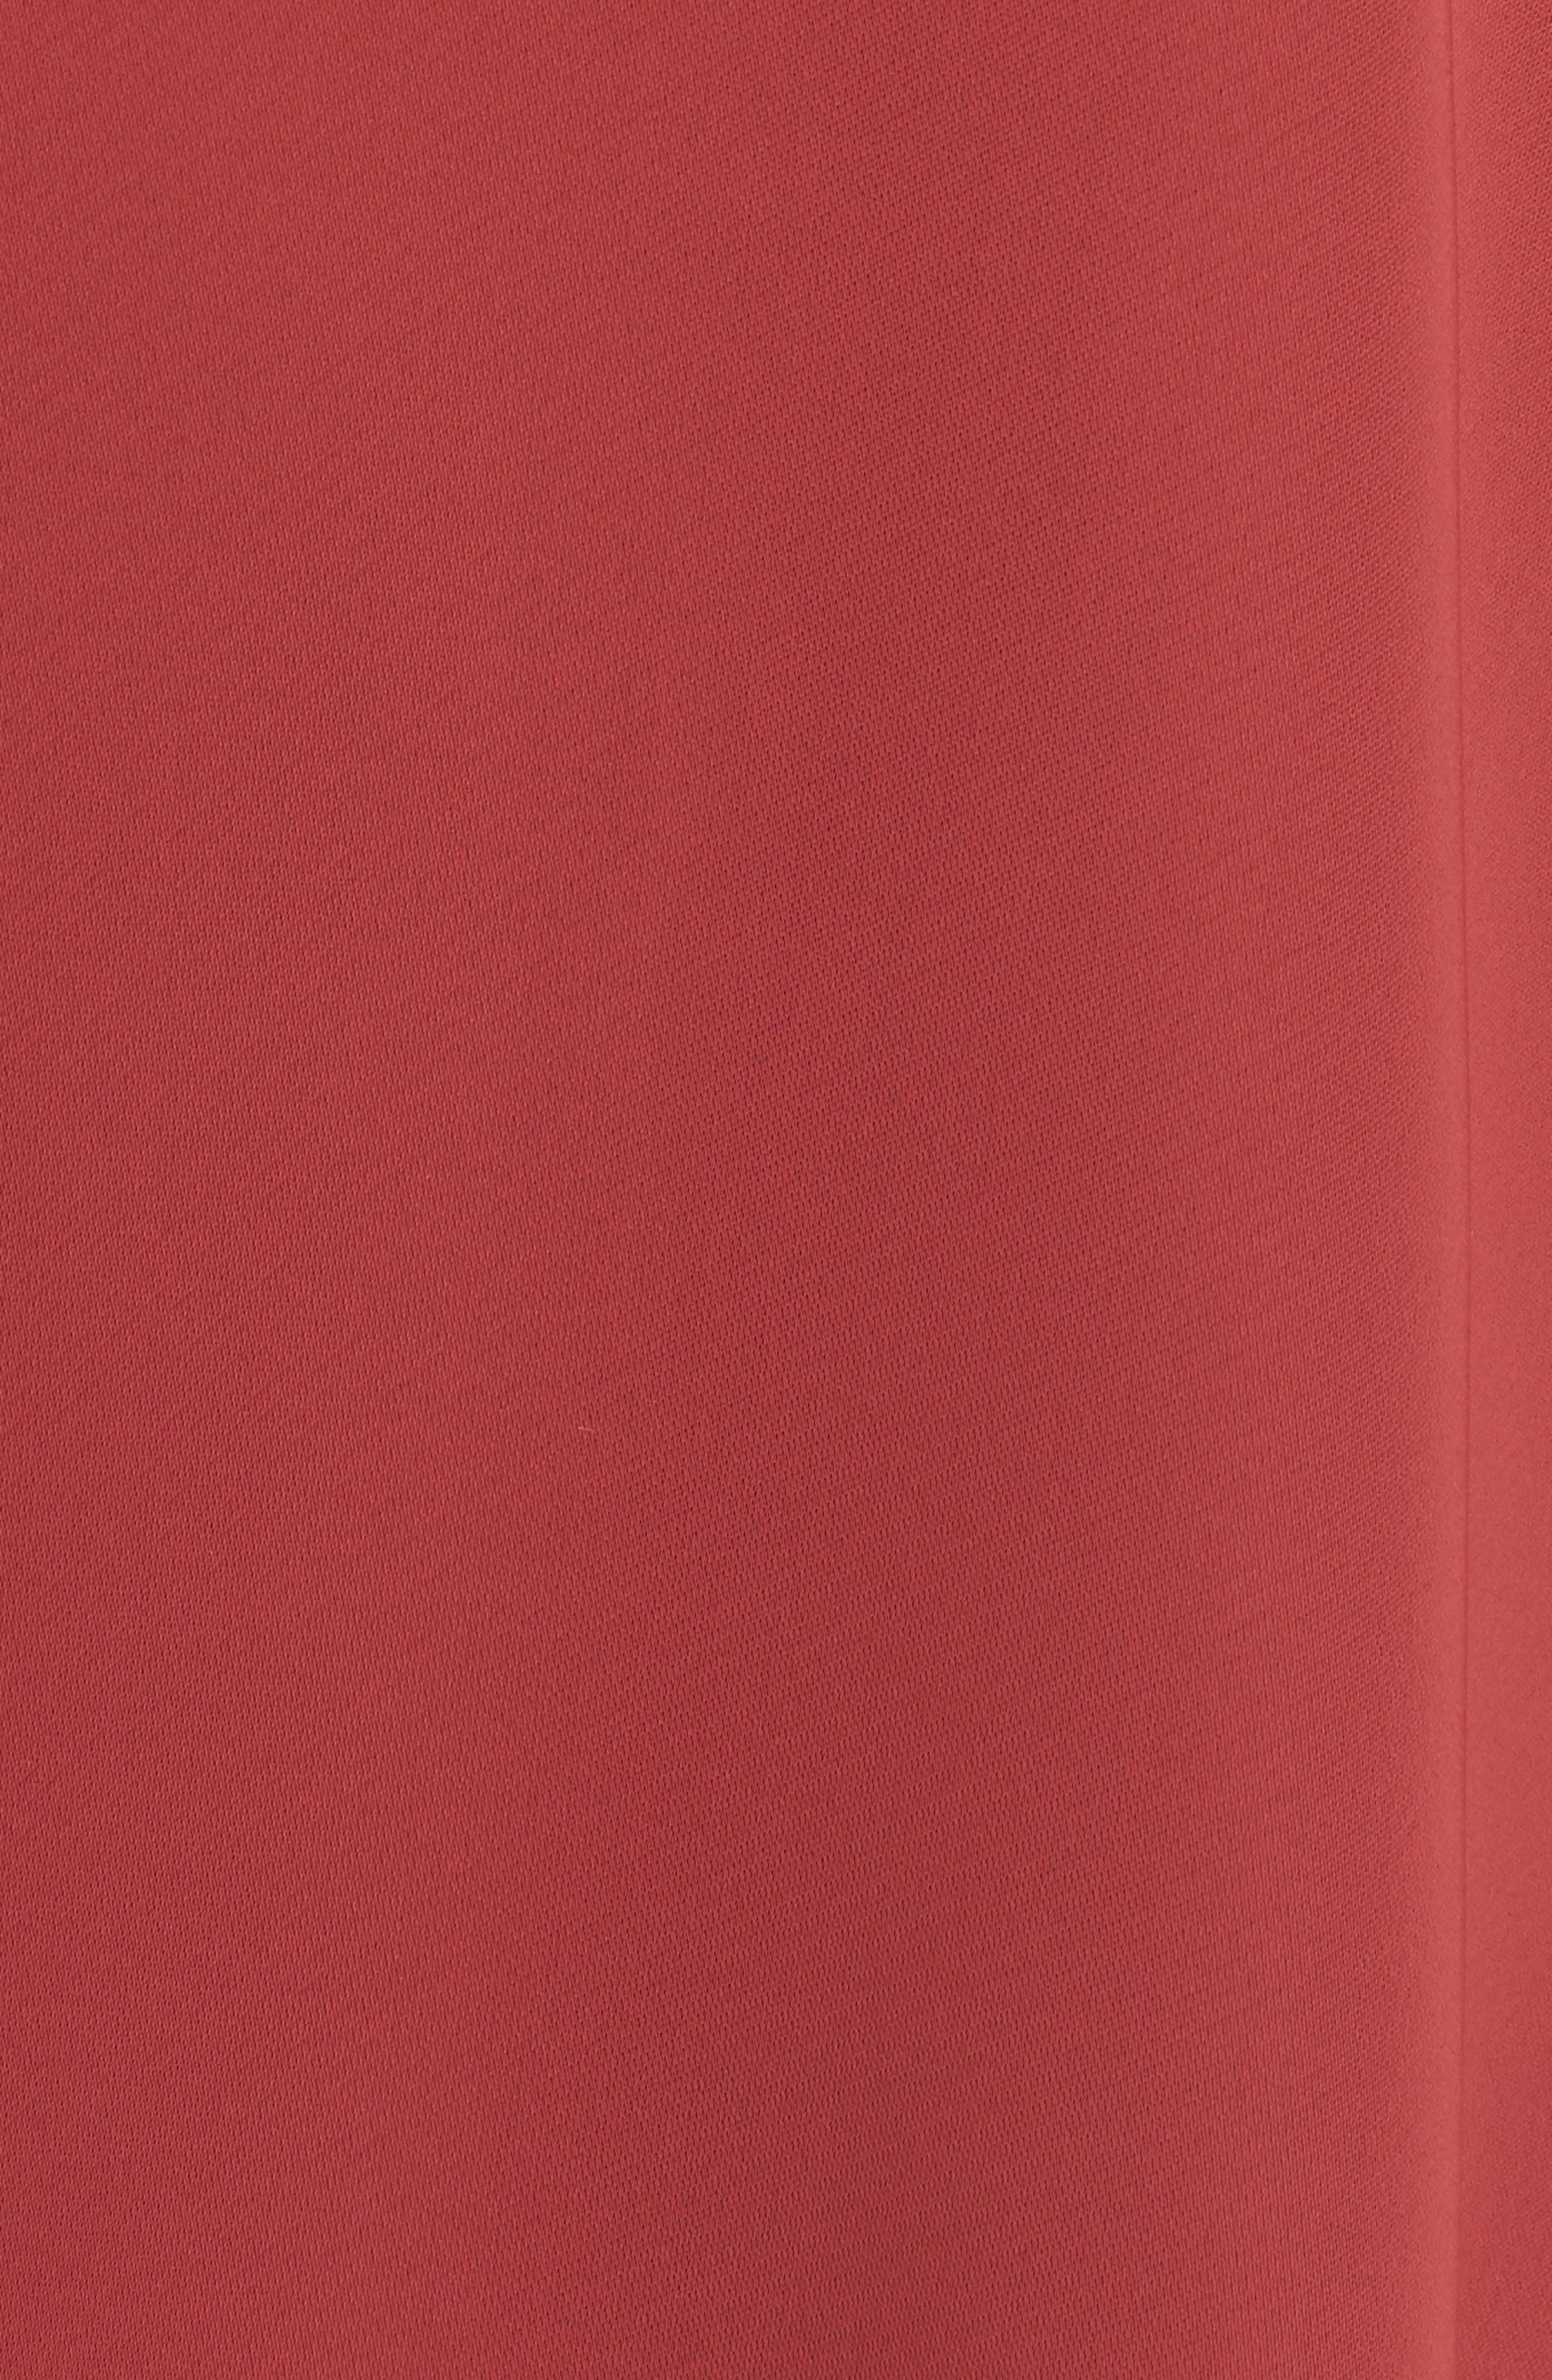 Majestic Matte Satin Blouse,                             Alternate thumbnail 25, color,